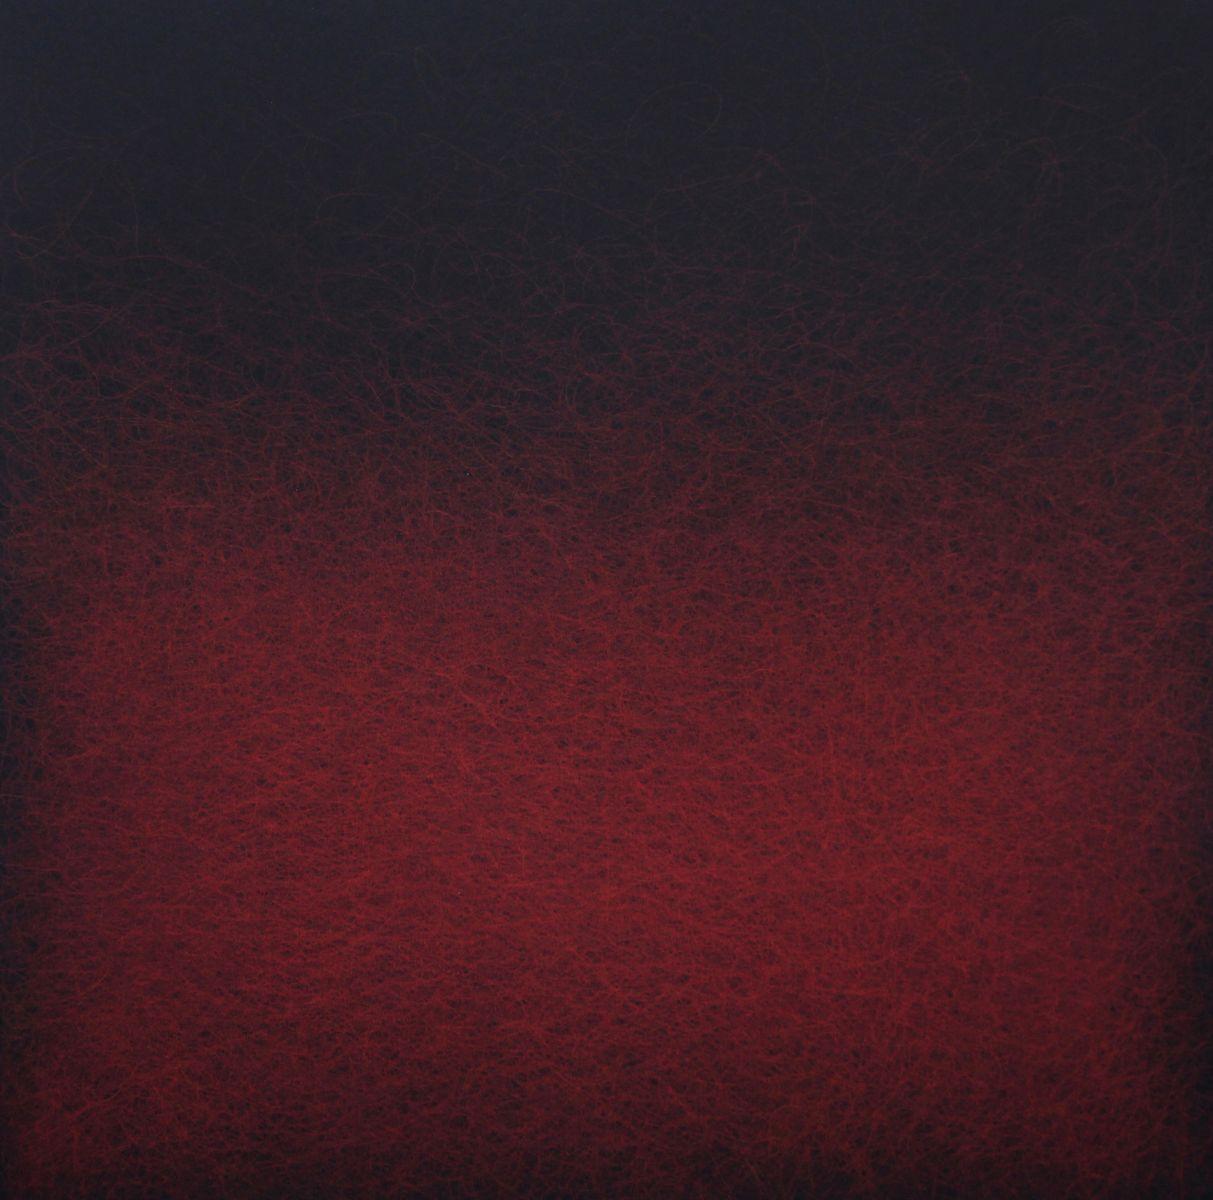 Quantum Entanglement (Red 4)